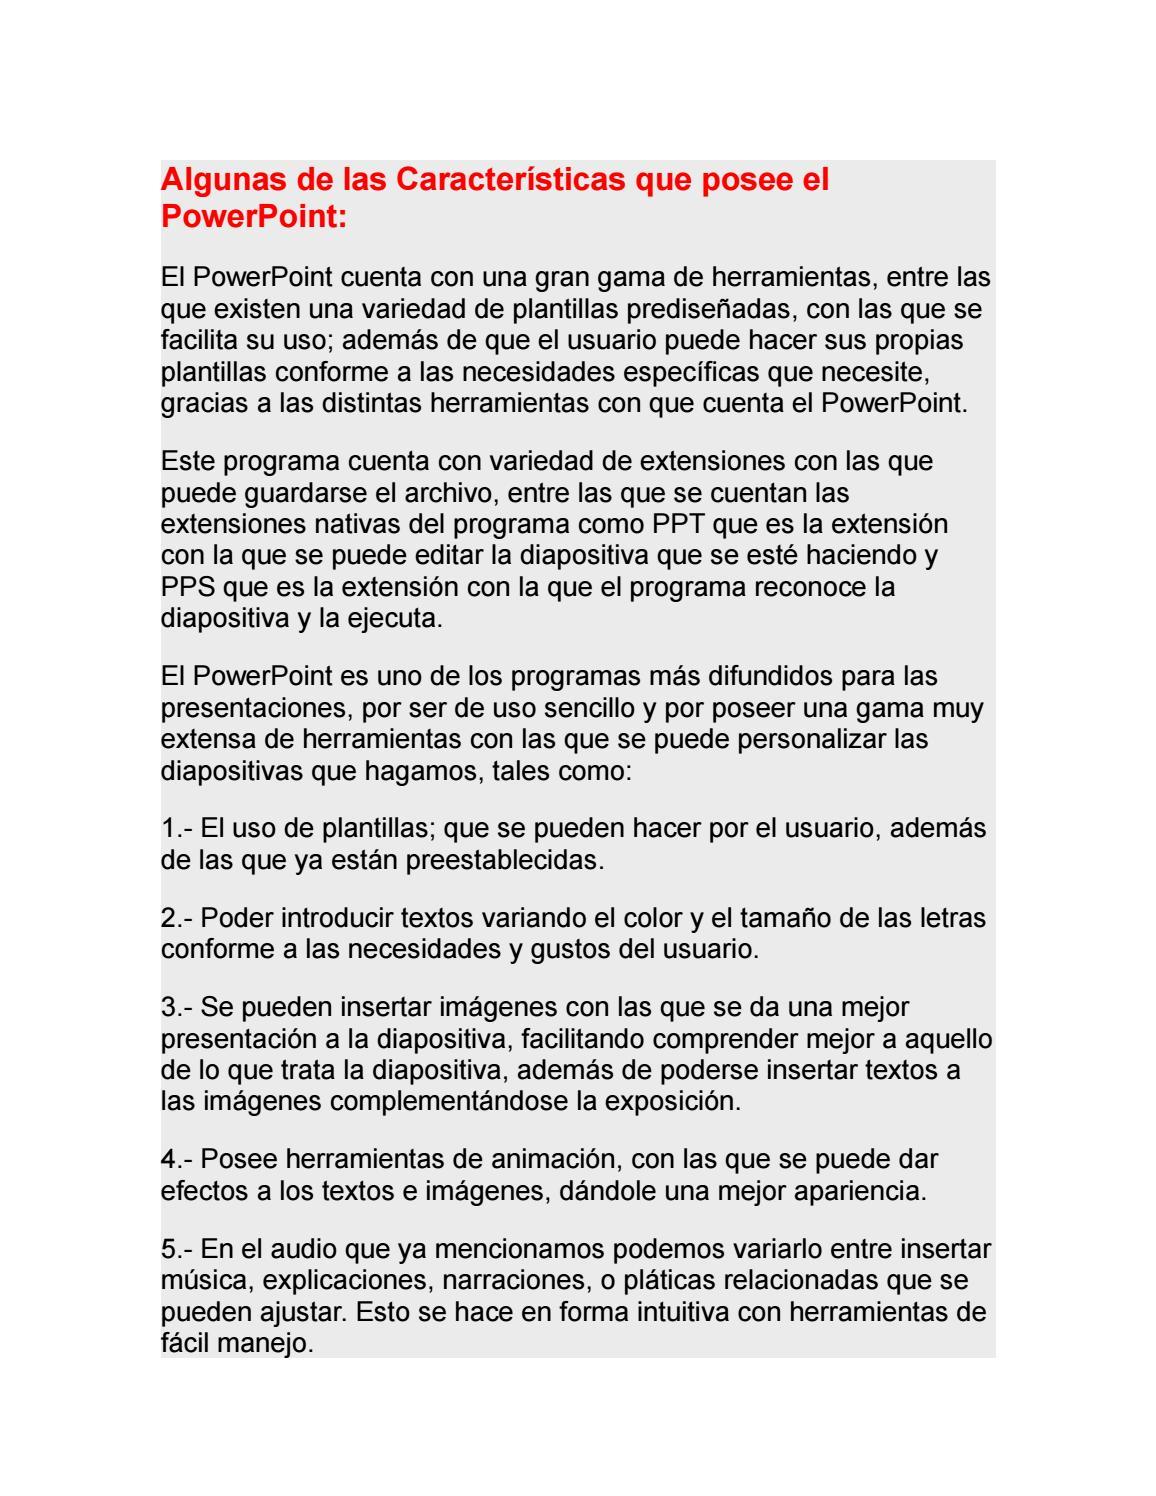 Características De Powerpoint by carlos cuc - issuu